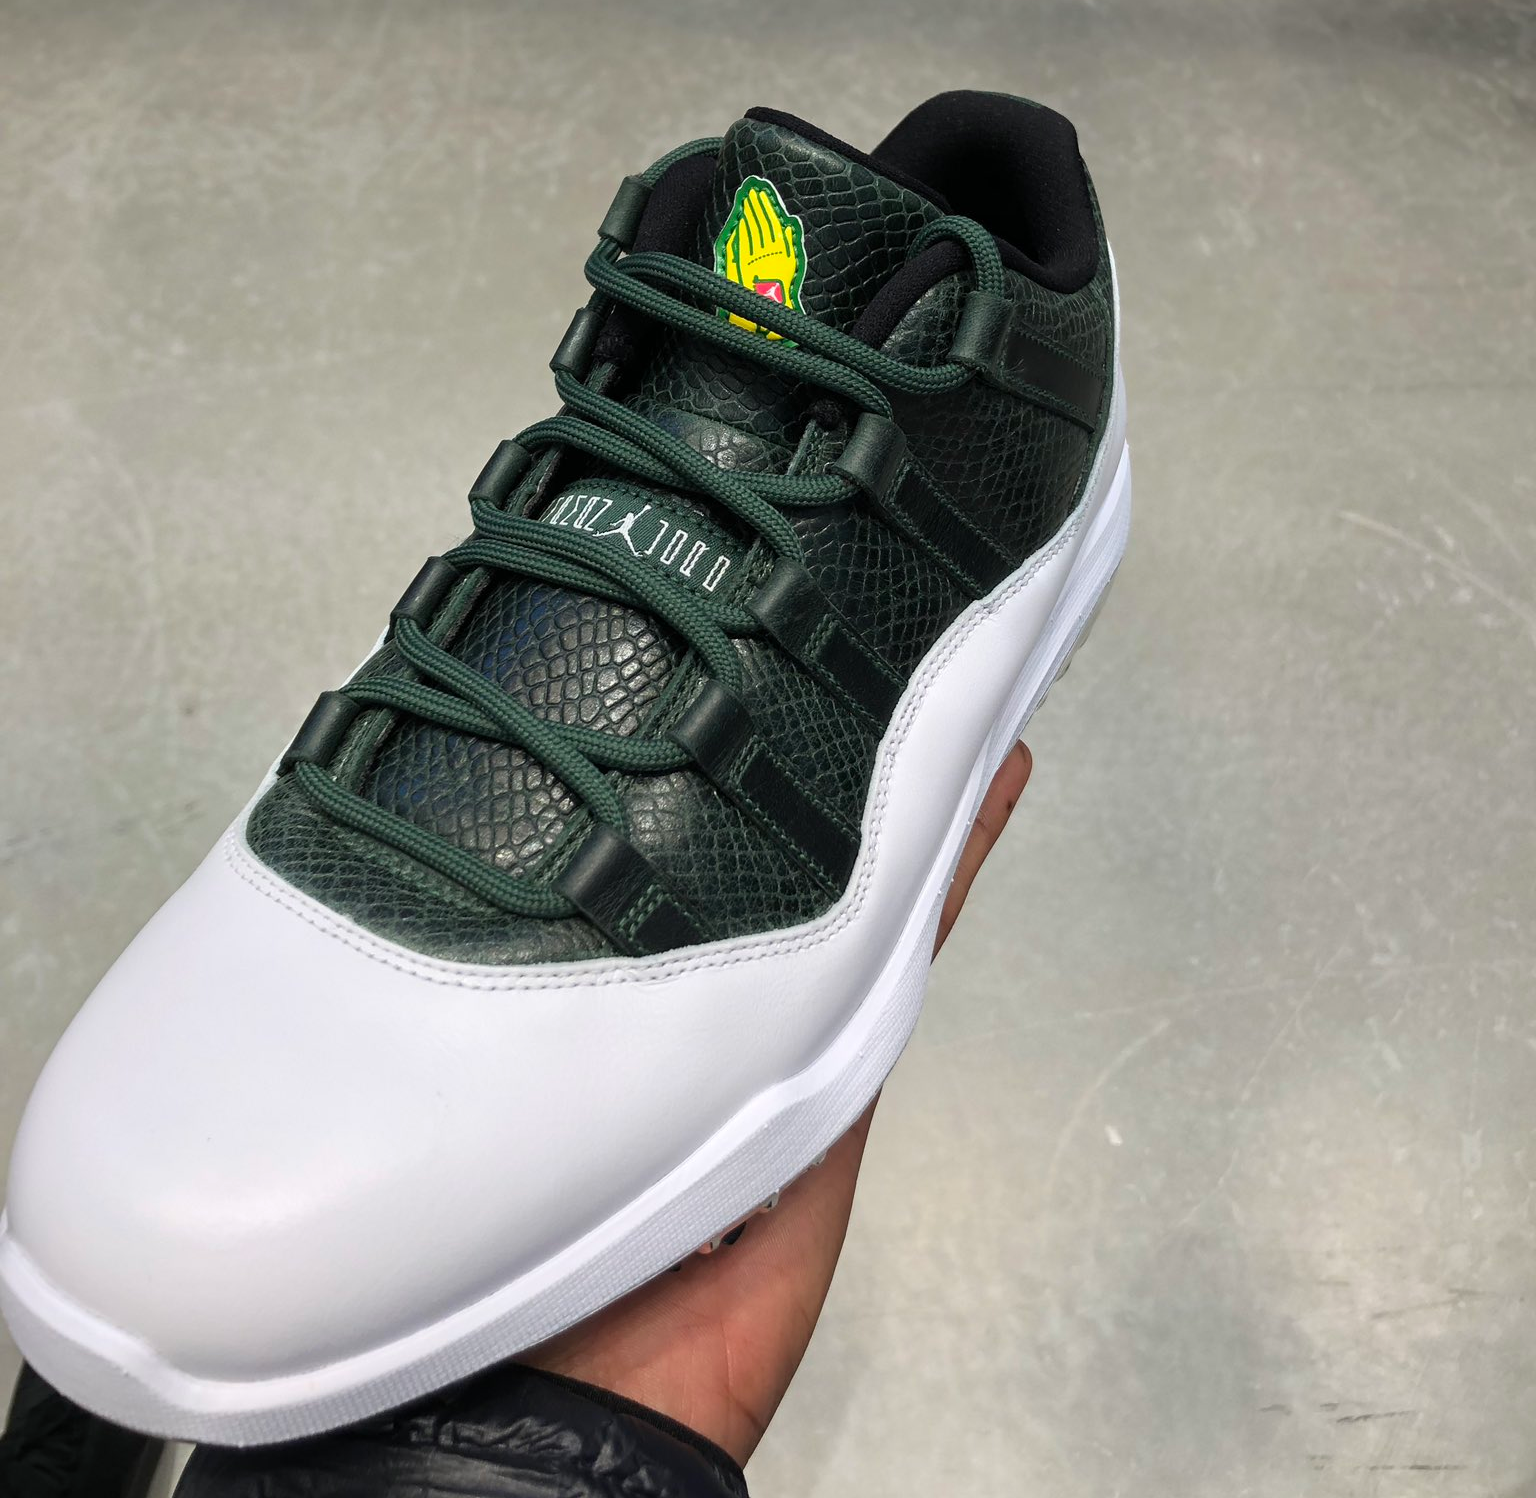 Jordan Brand Is Celebrating the Masters